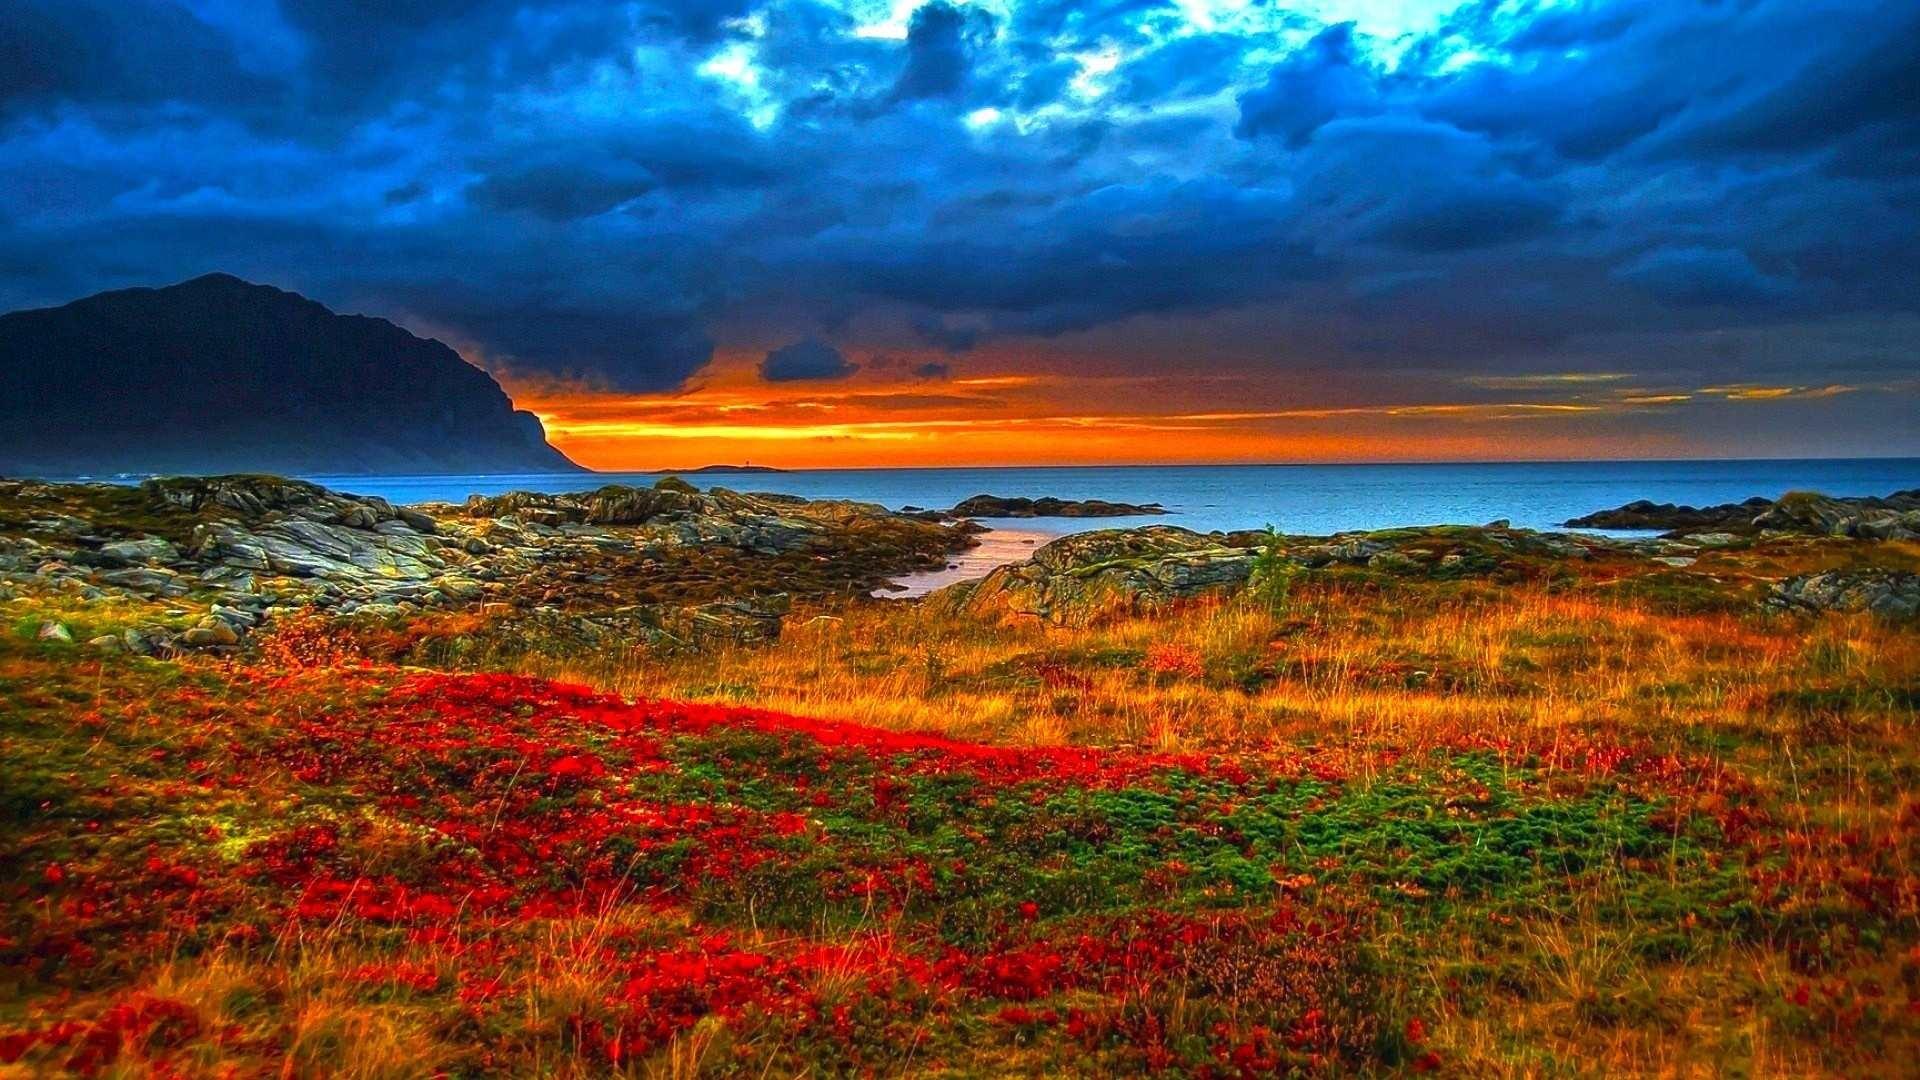 Res: 1920x1080, image gallery of nature beauty photos 17 beautiful nature wallpaper hd natural  beauty hd desktop